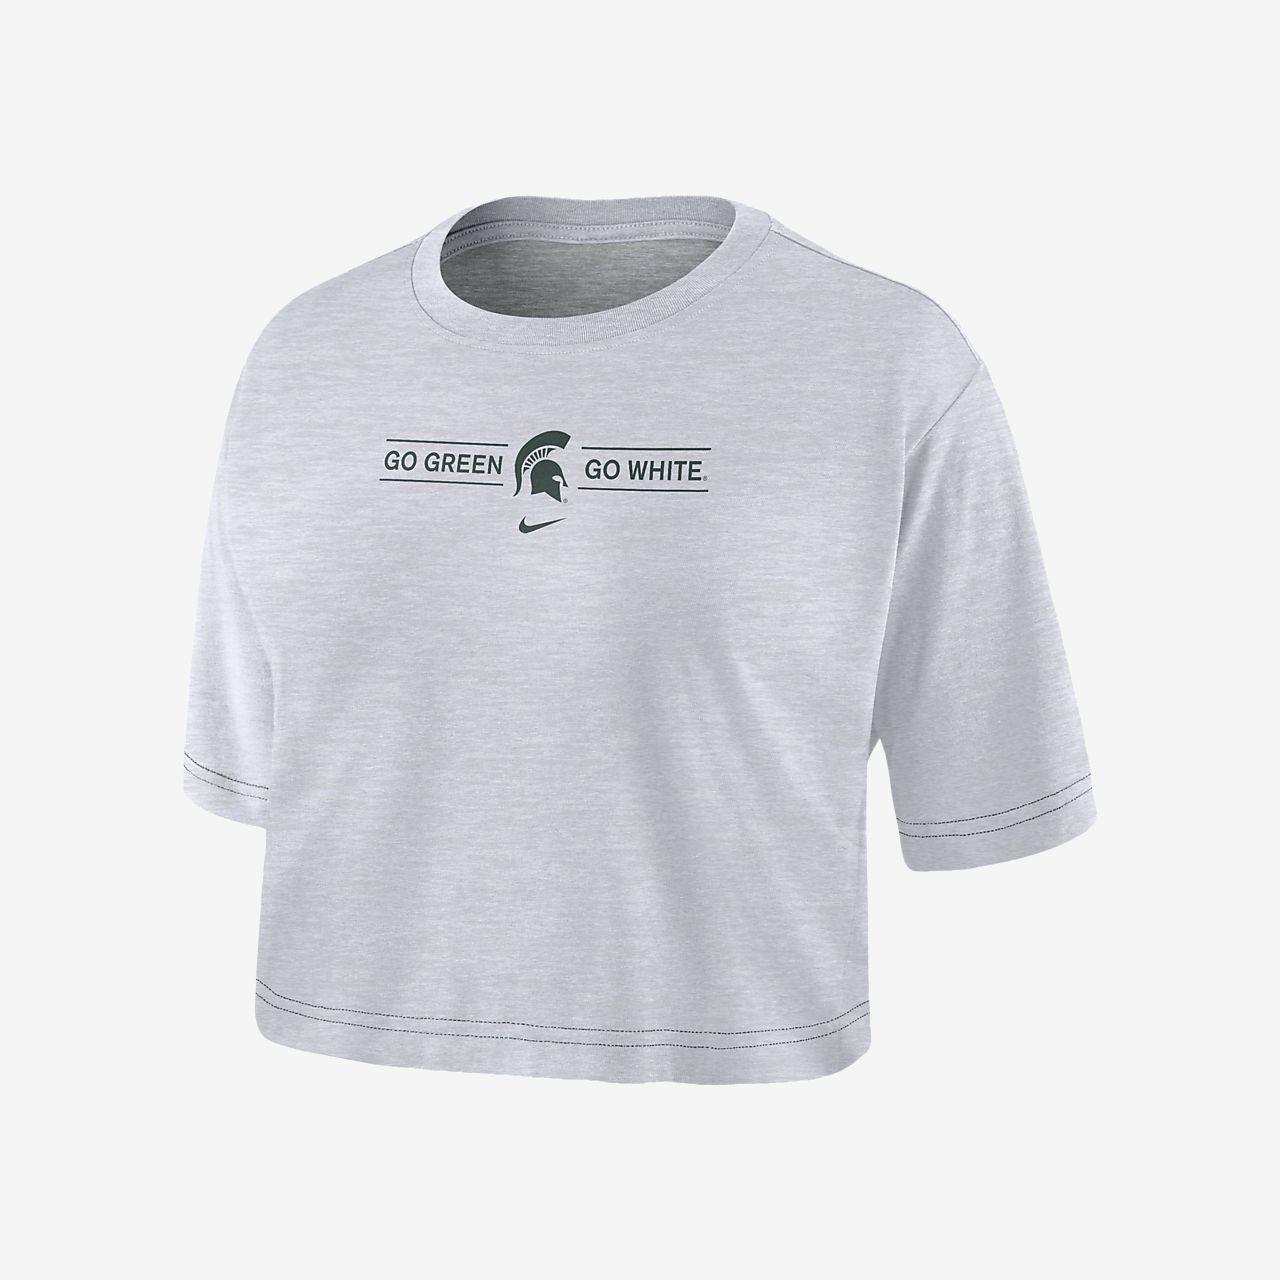 Nike College Dri-FIT (Michigan State) Women's Cropped T-Shirt